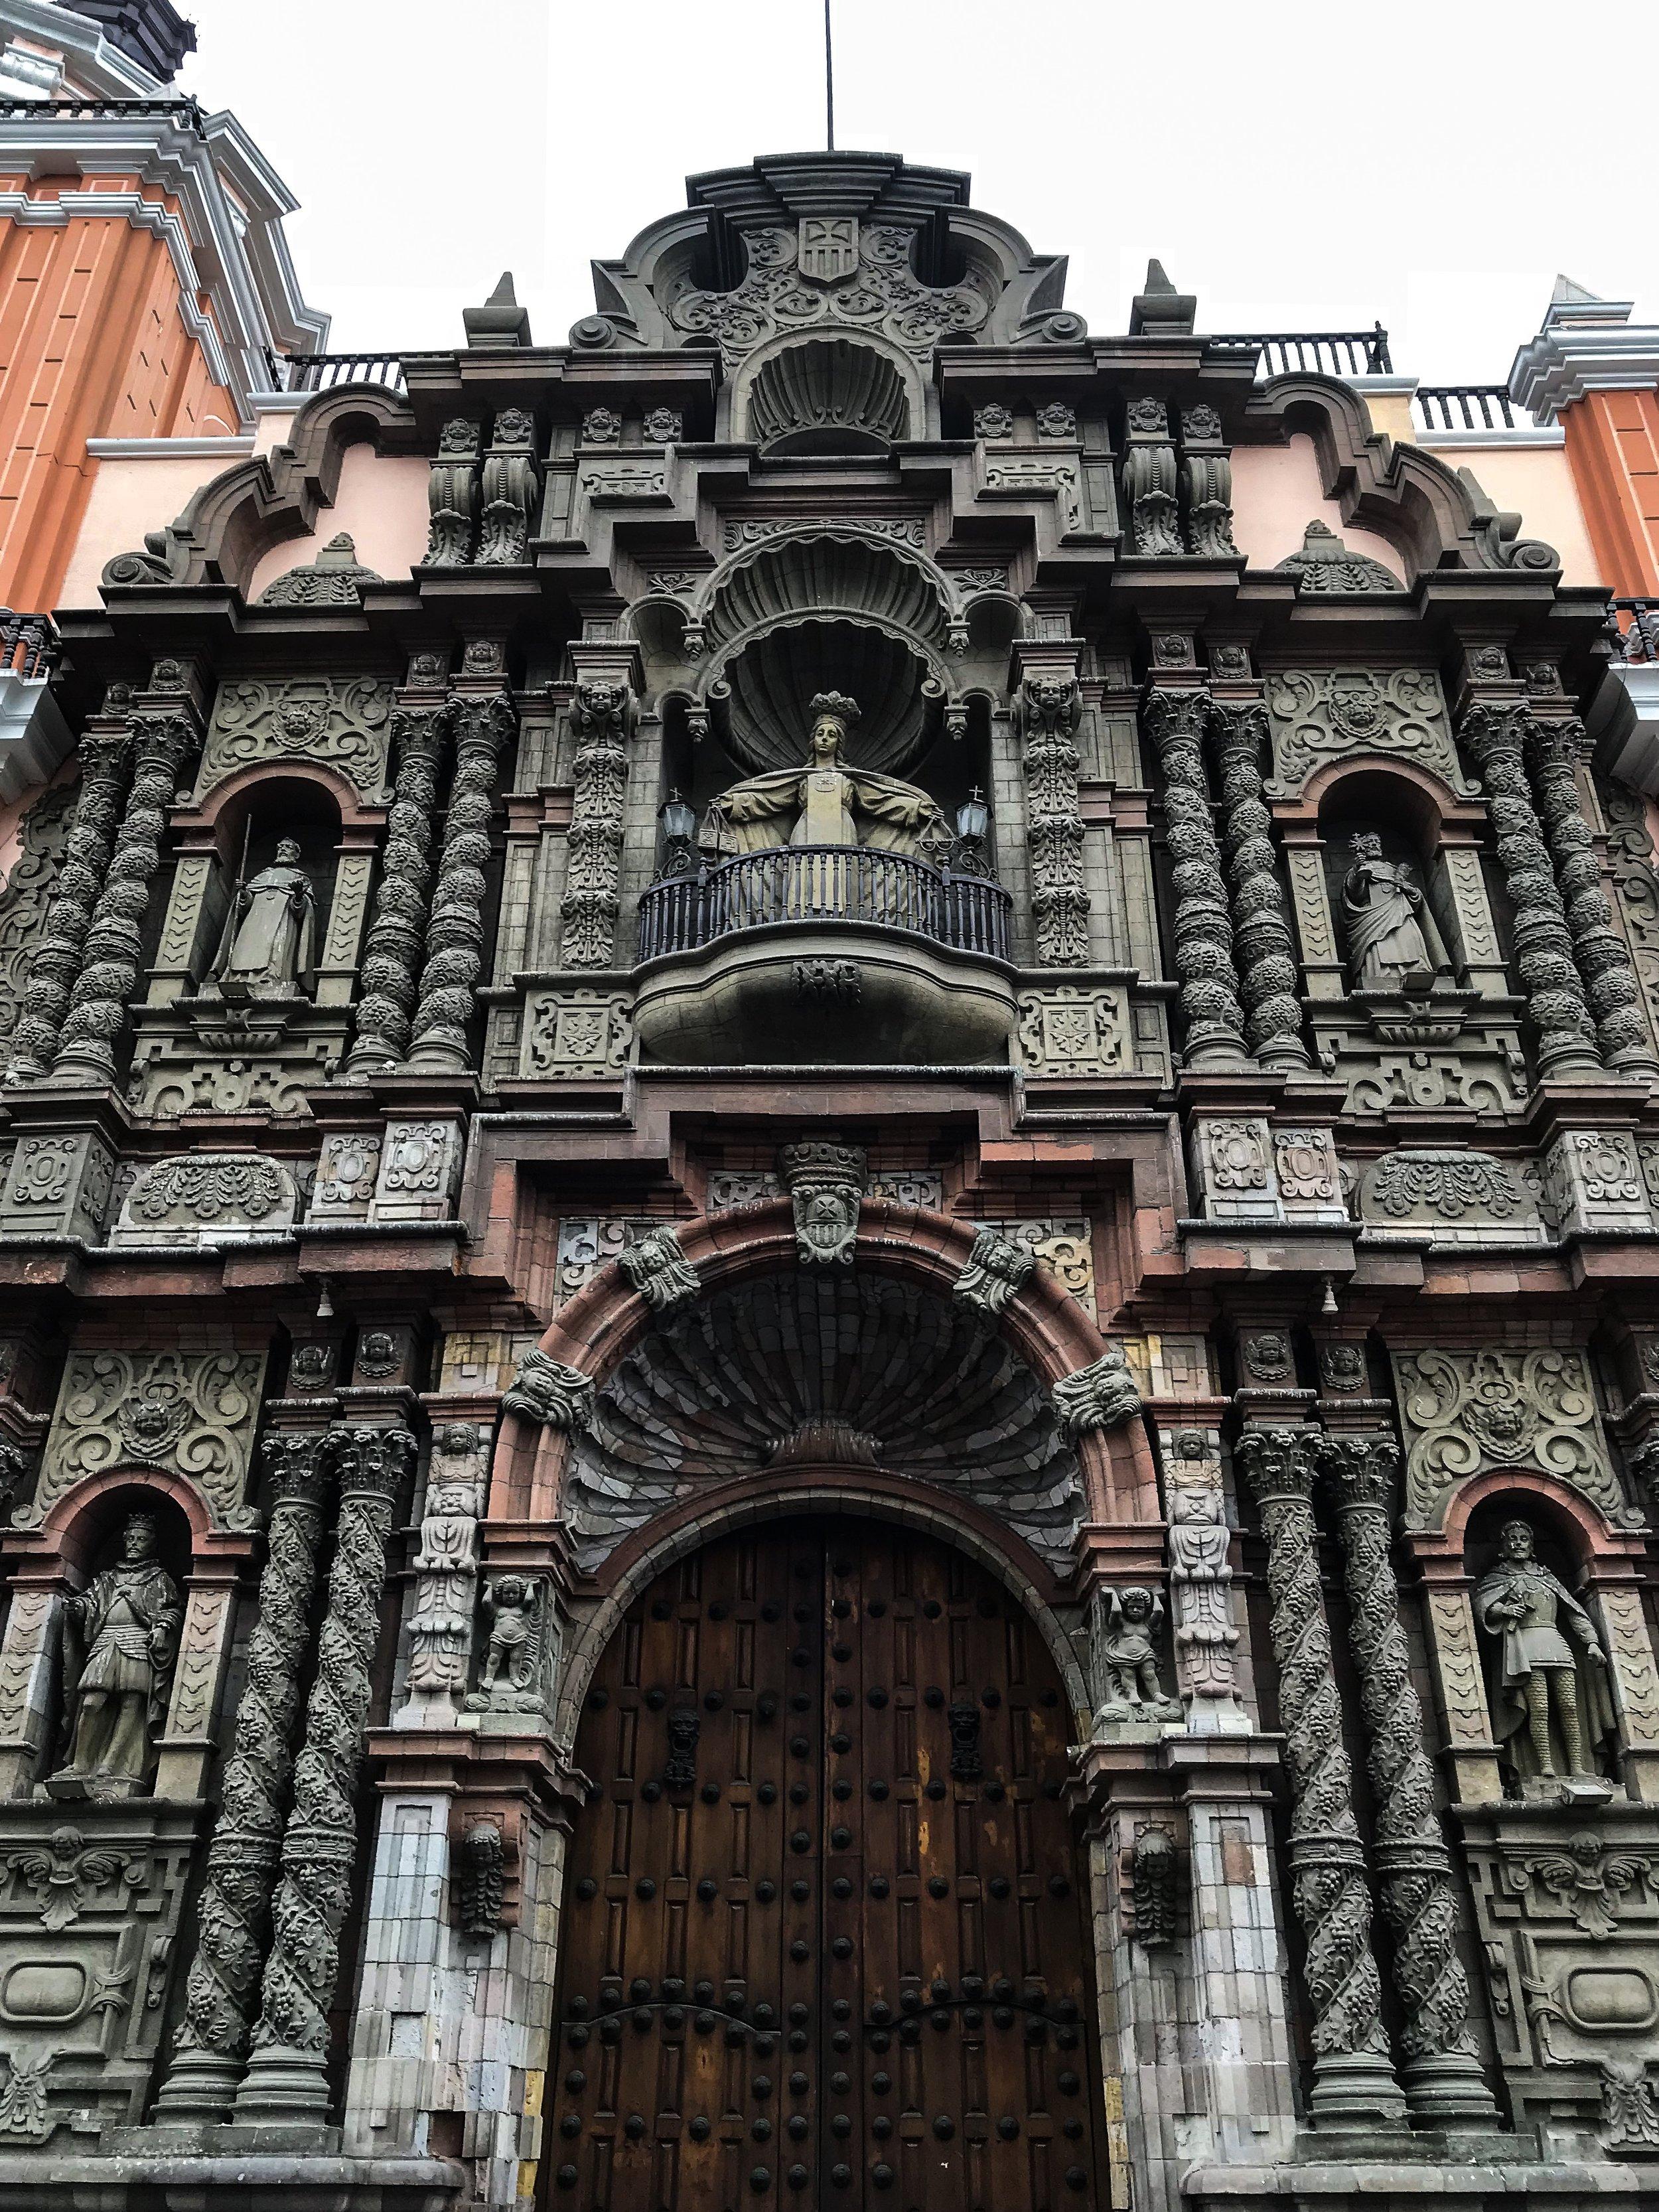 The highly-detailed façade